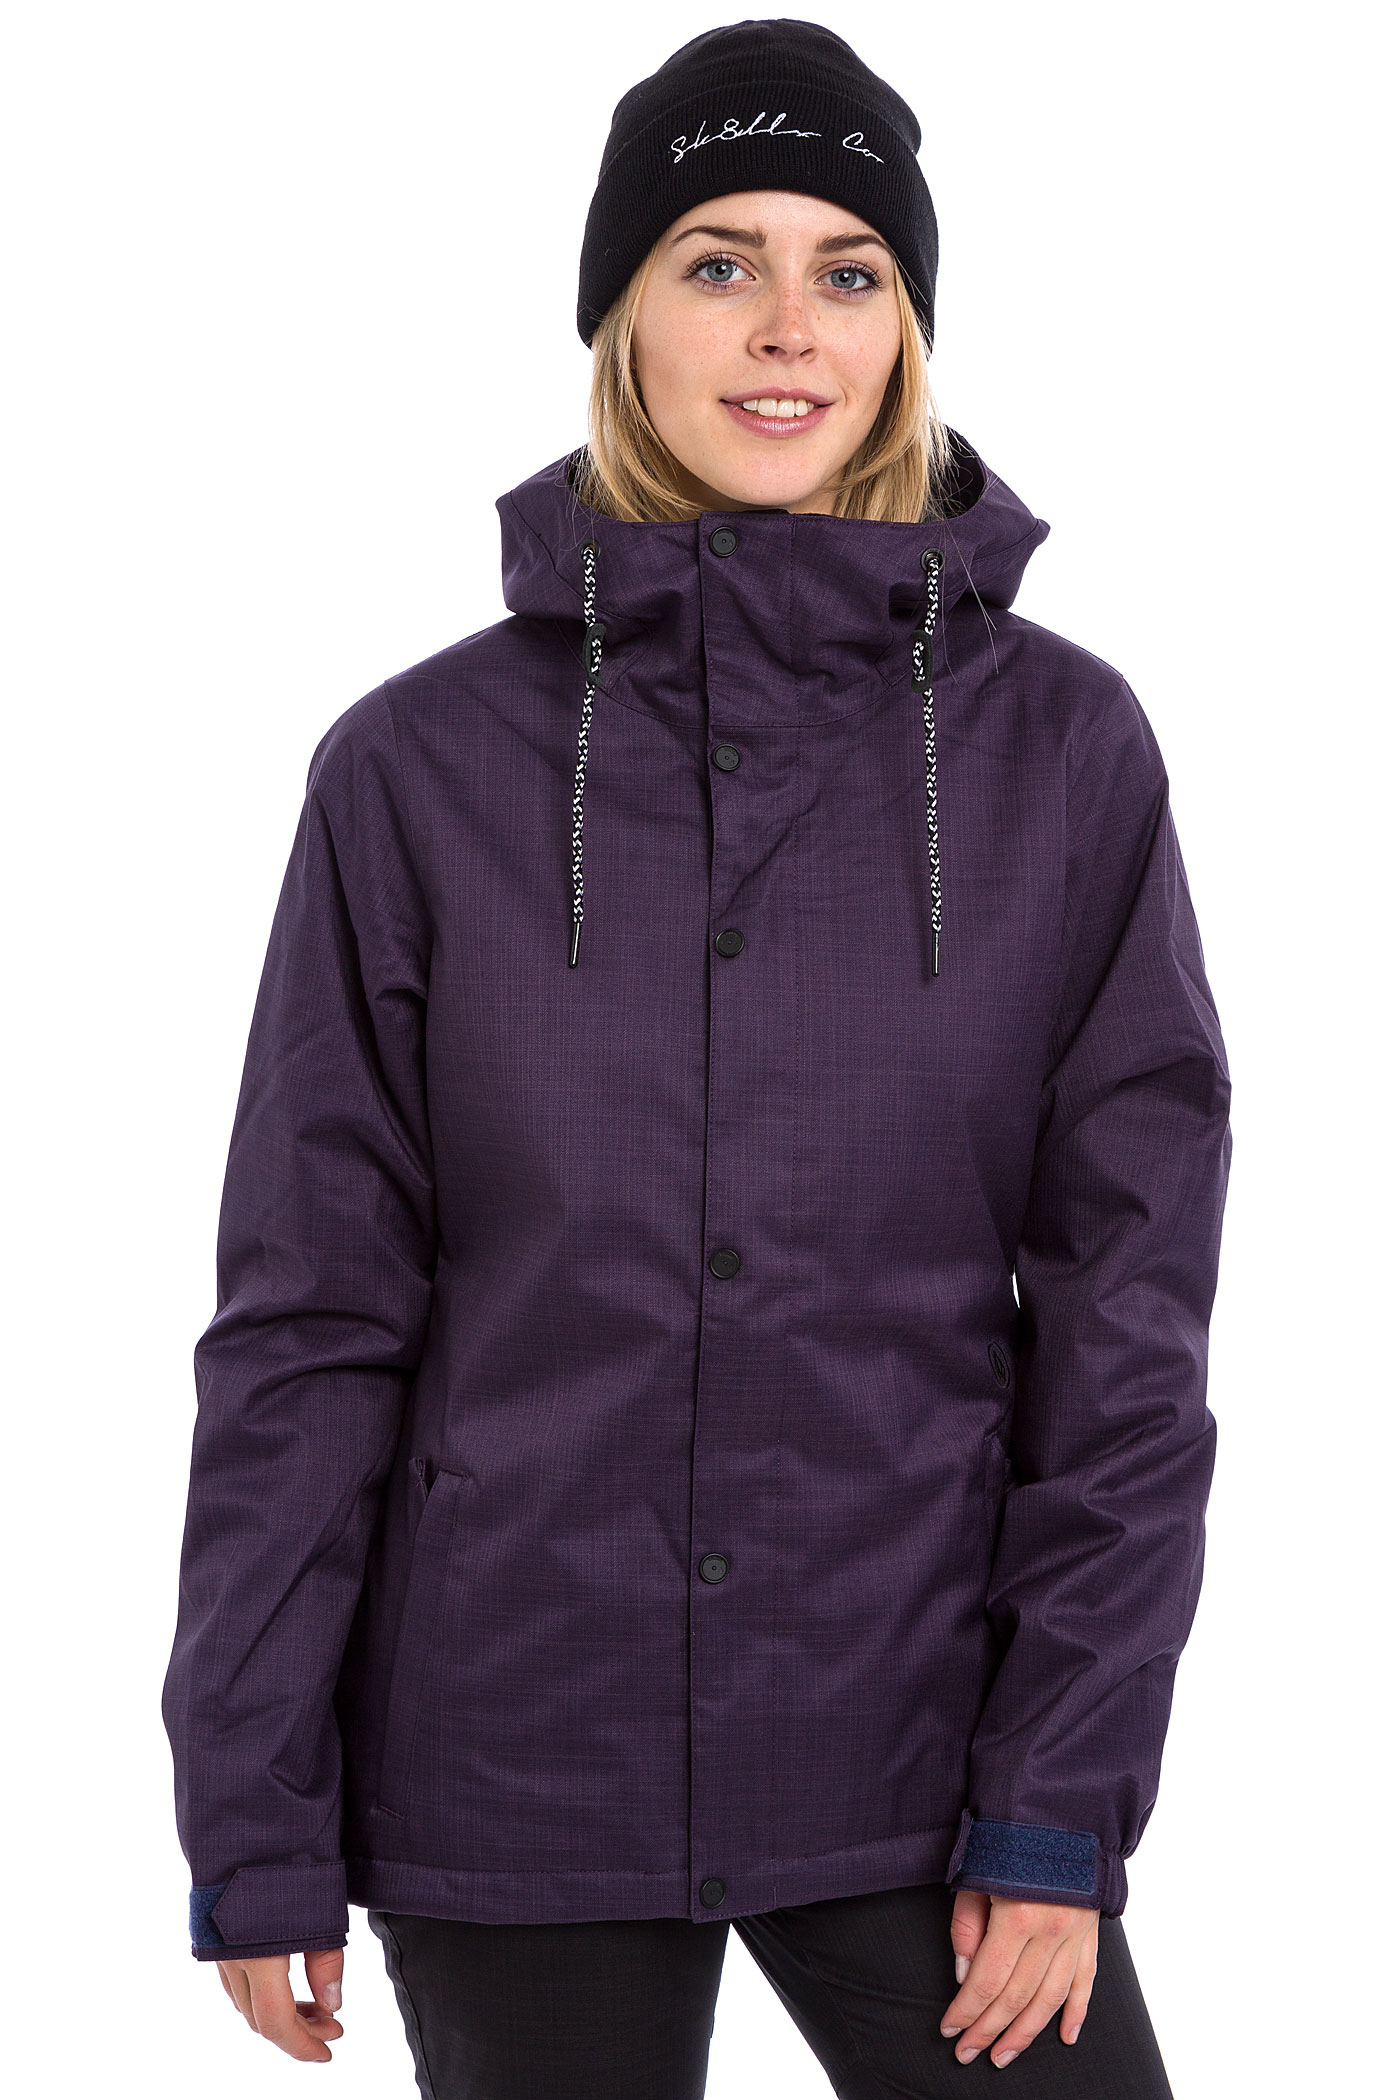 Volcom womens snowboarding jacket